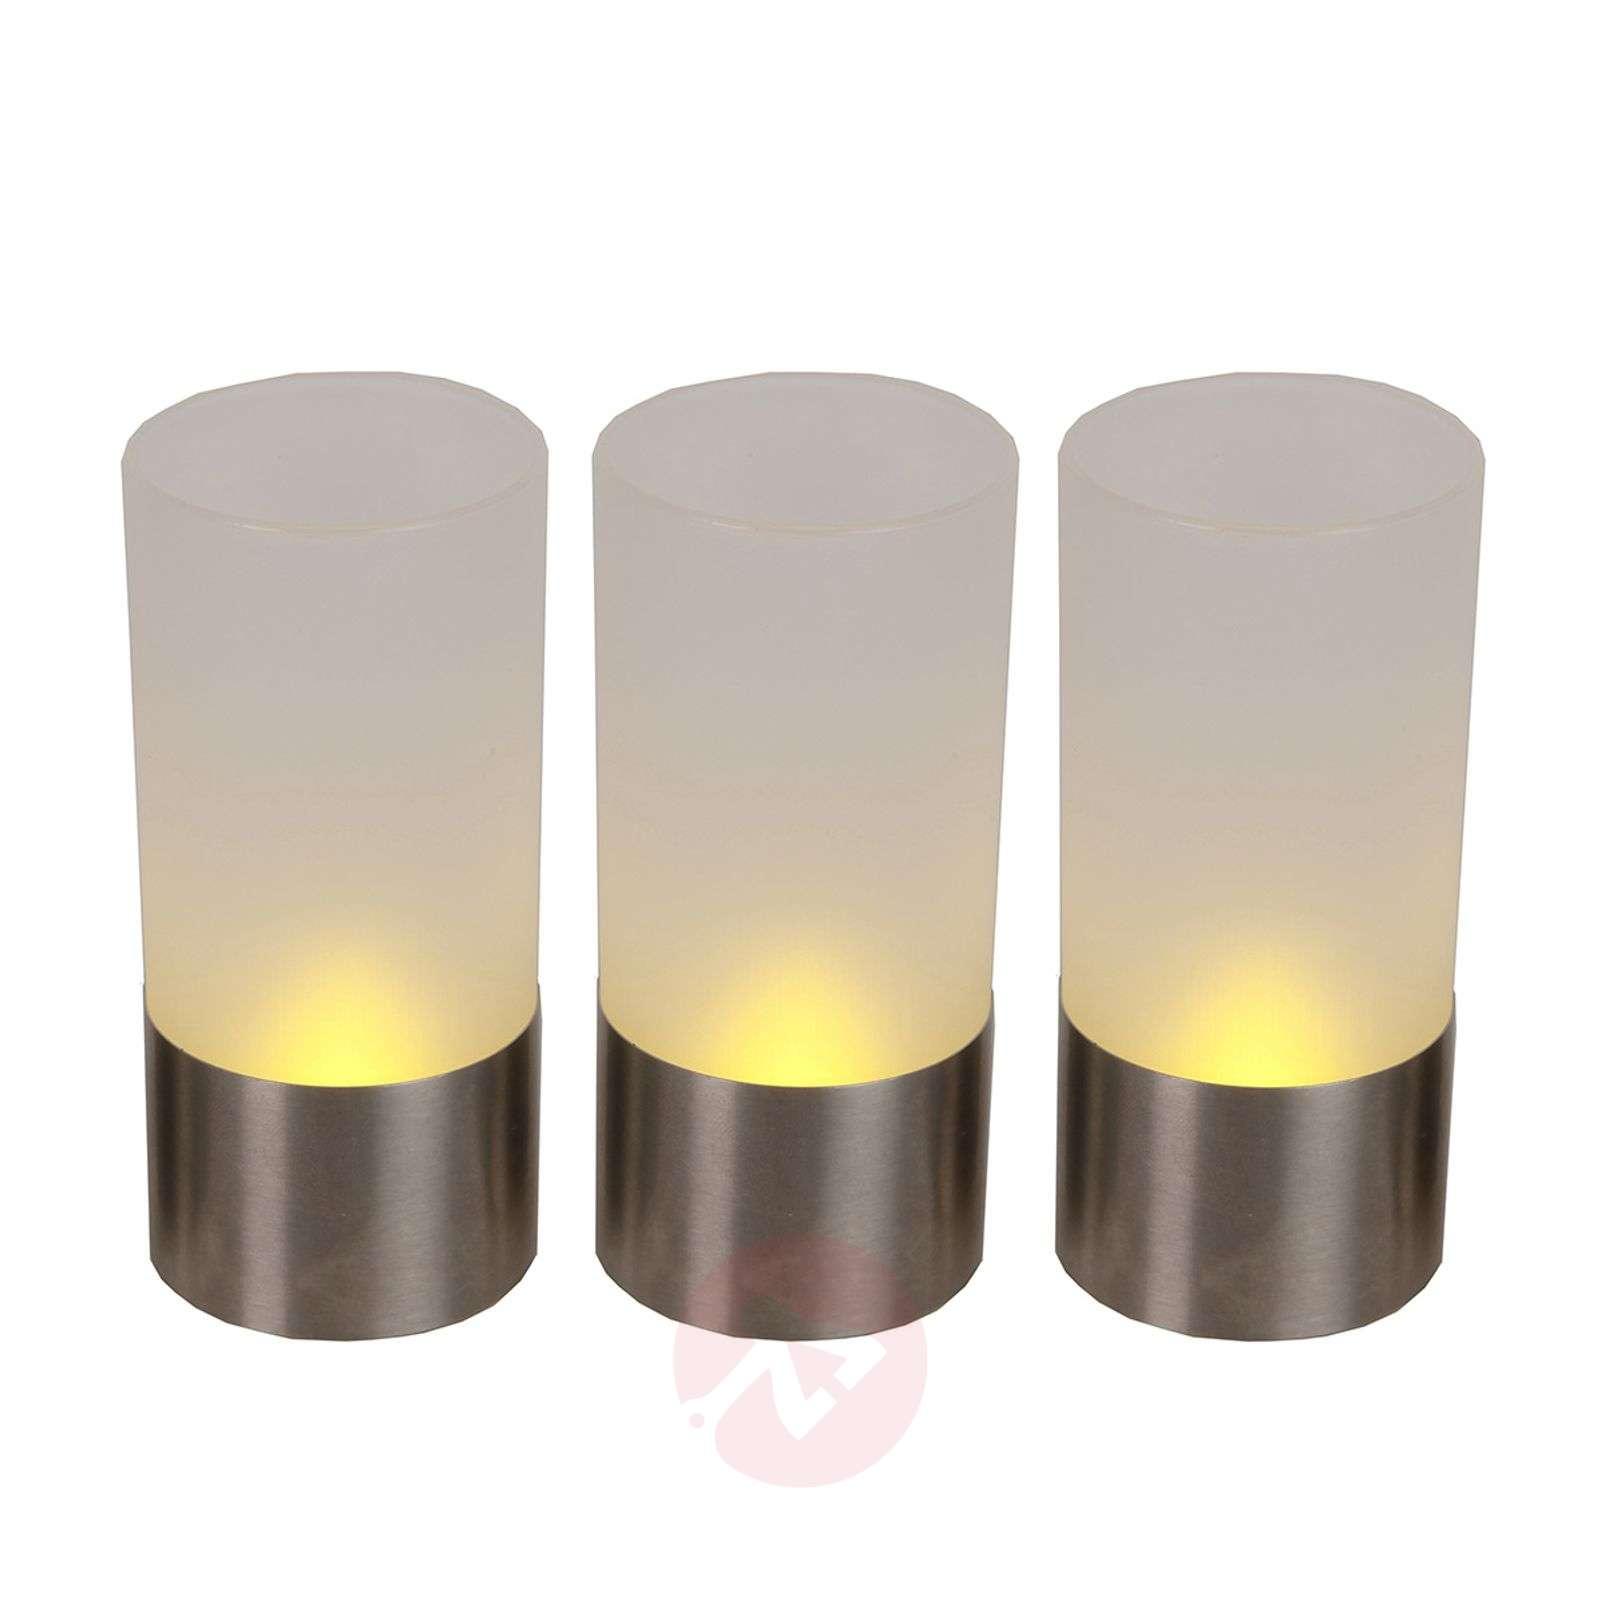 Moderni LED-lyhty, 3 kpl:n setti-1522733-01